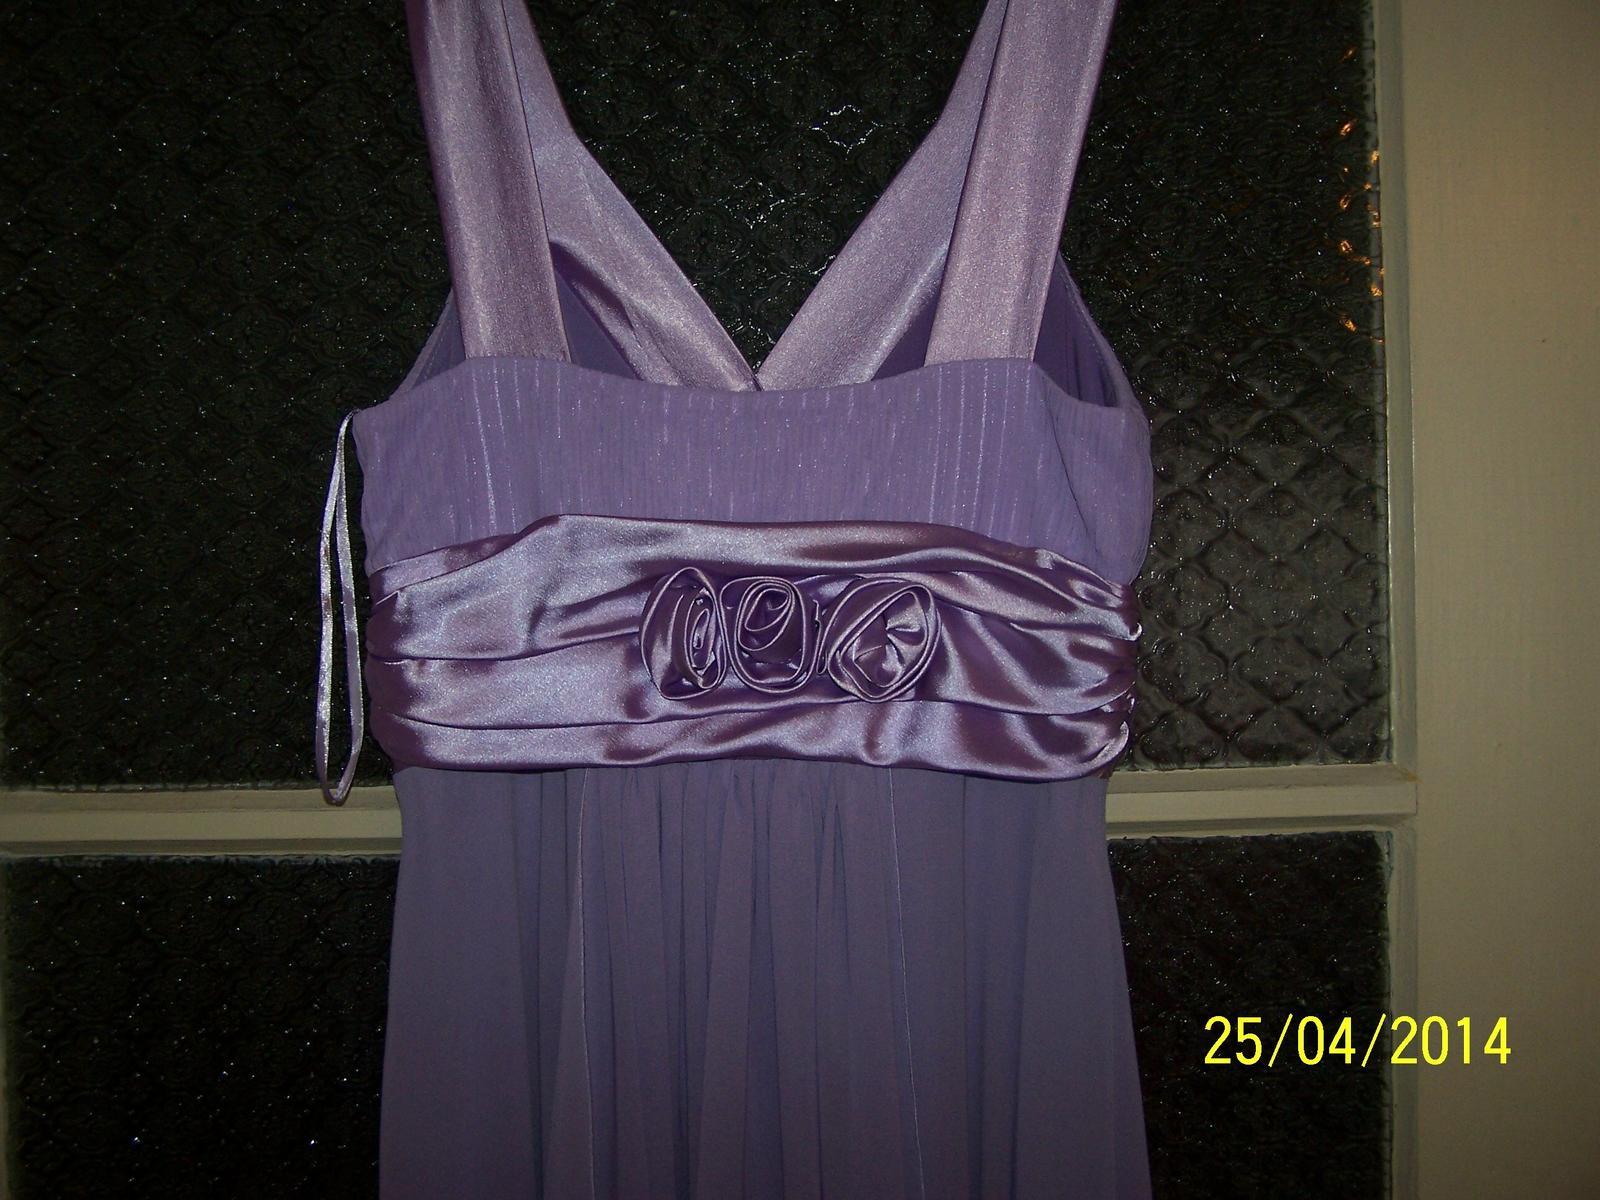 Fialové spoločenské šaty - Obrázok č. 3